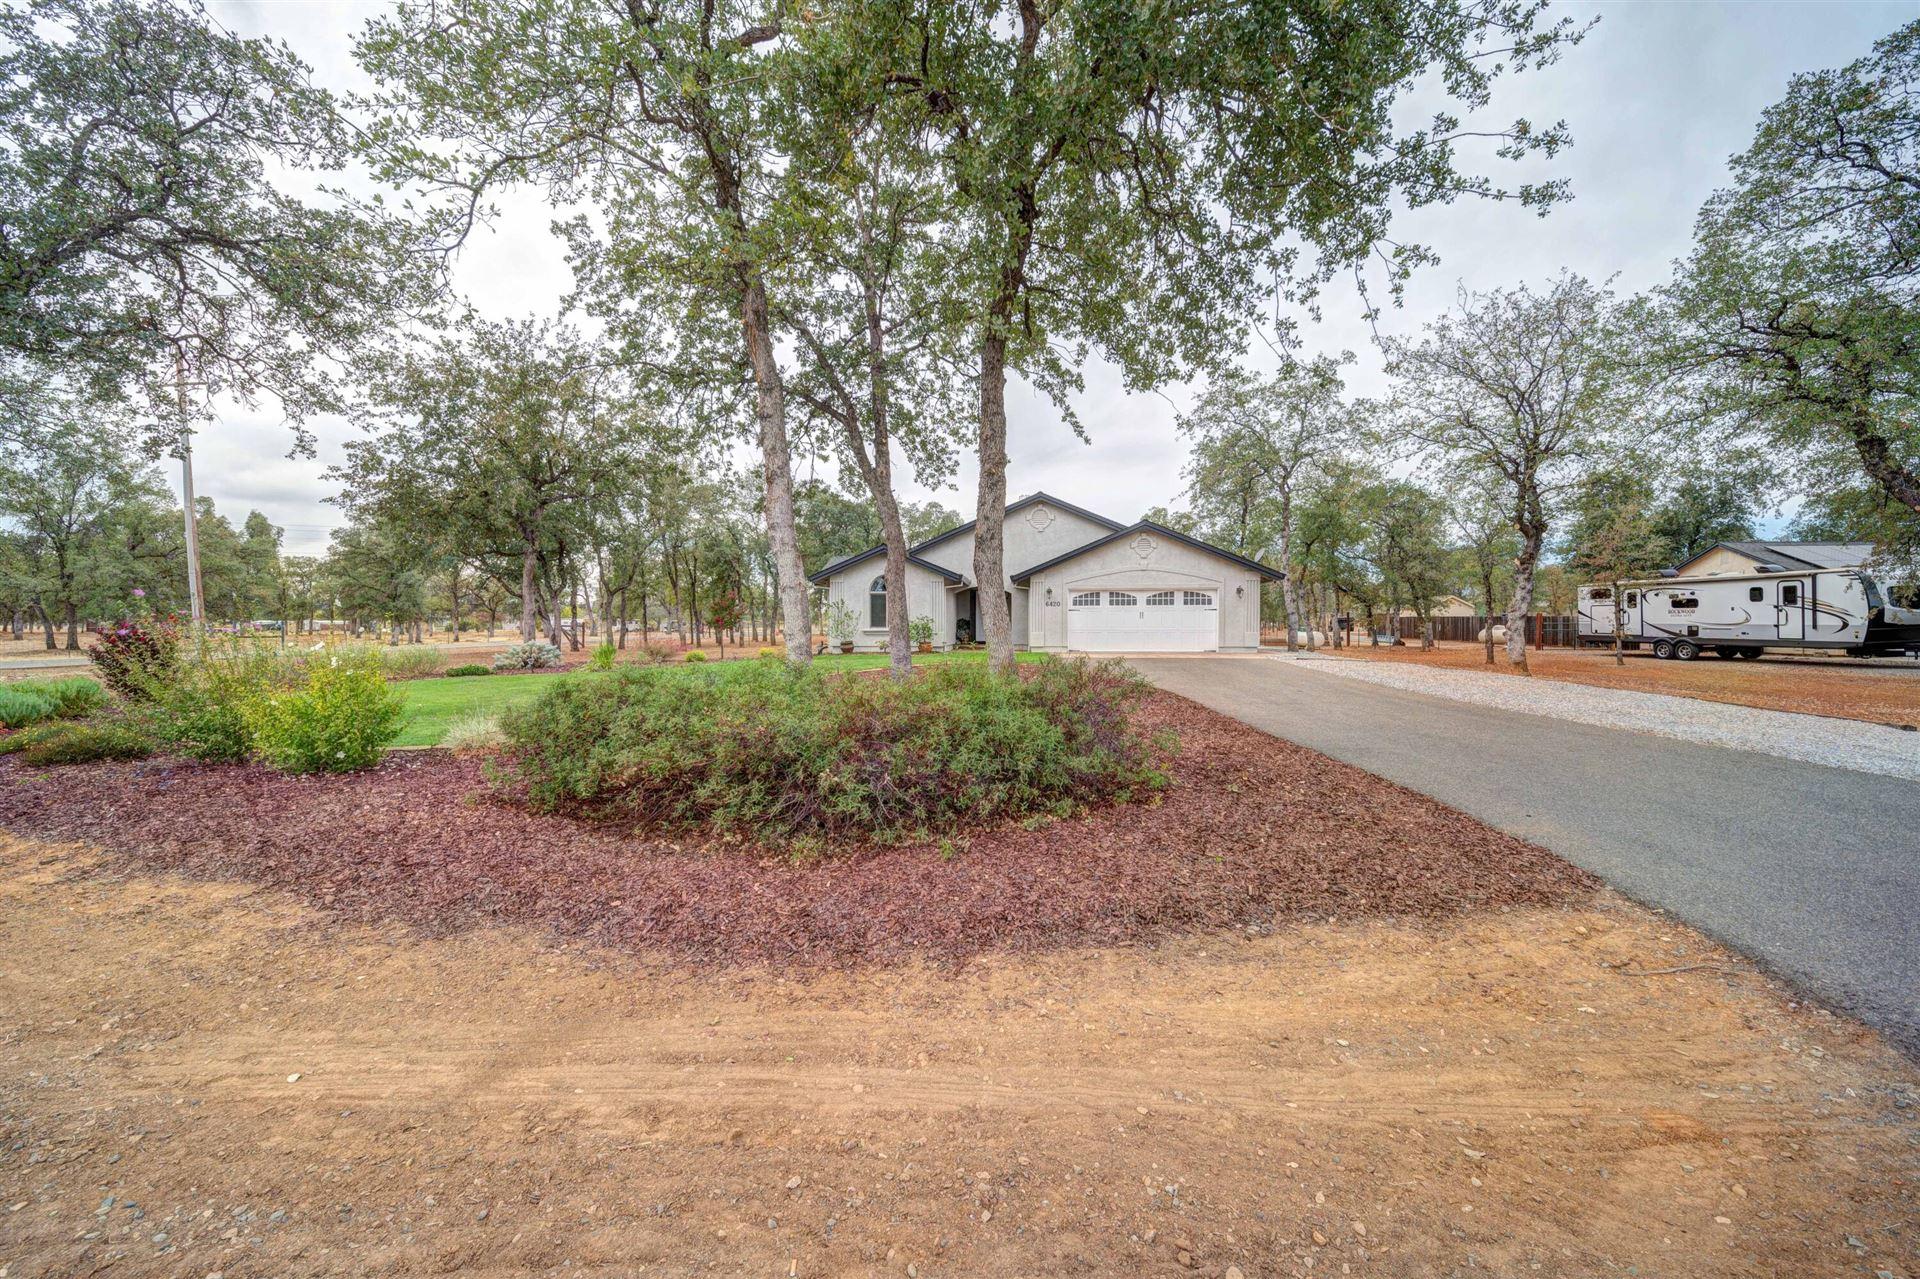 Photo of 6420 Ledgestone Ct, Anderson, CA 96007 (MLS # 21-4773)